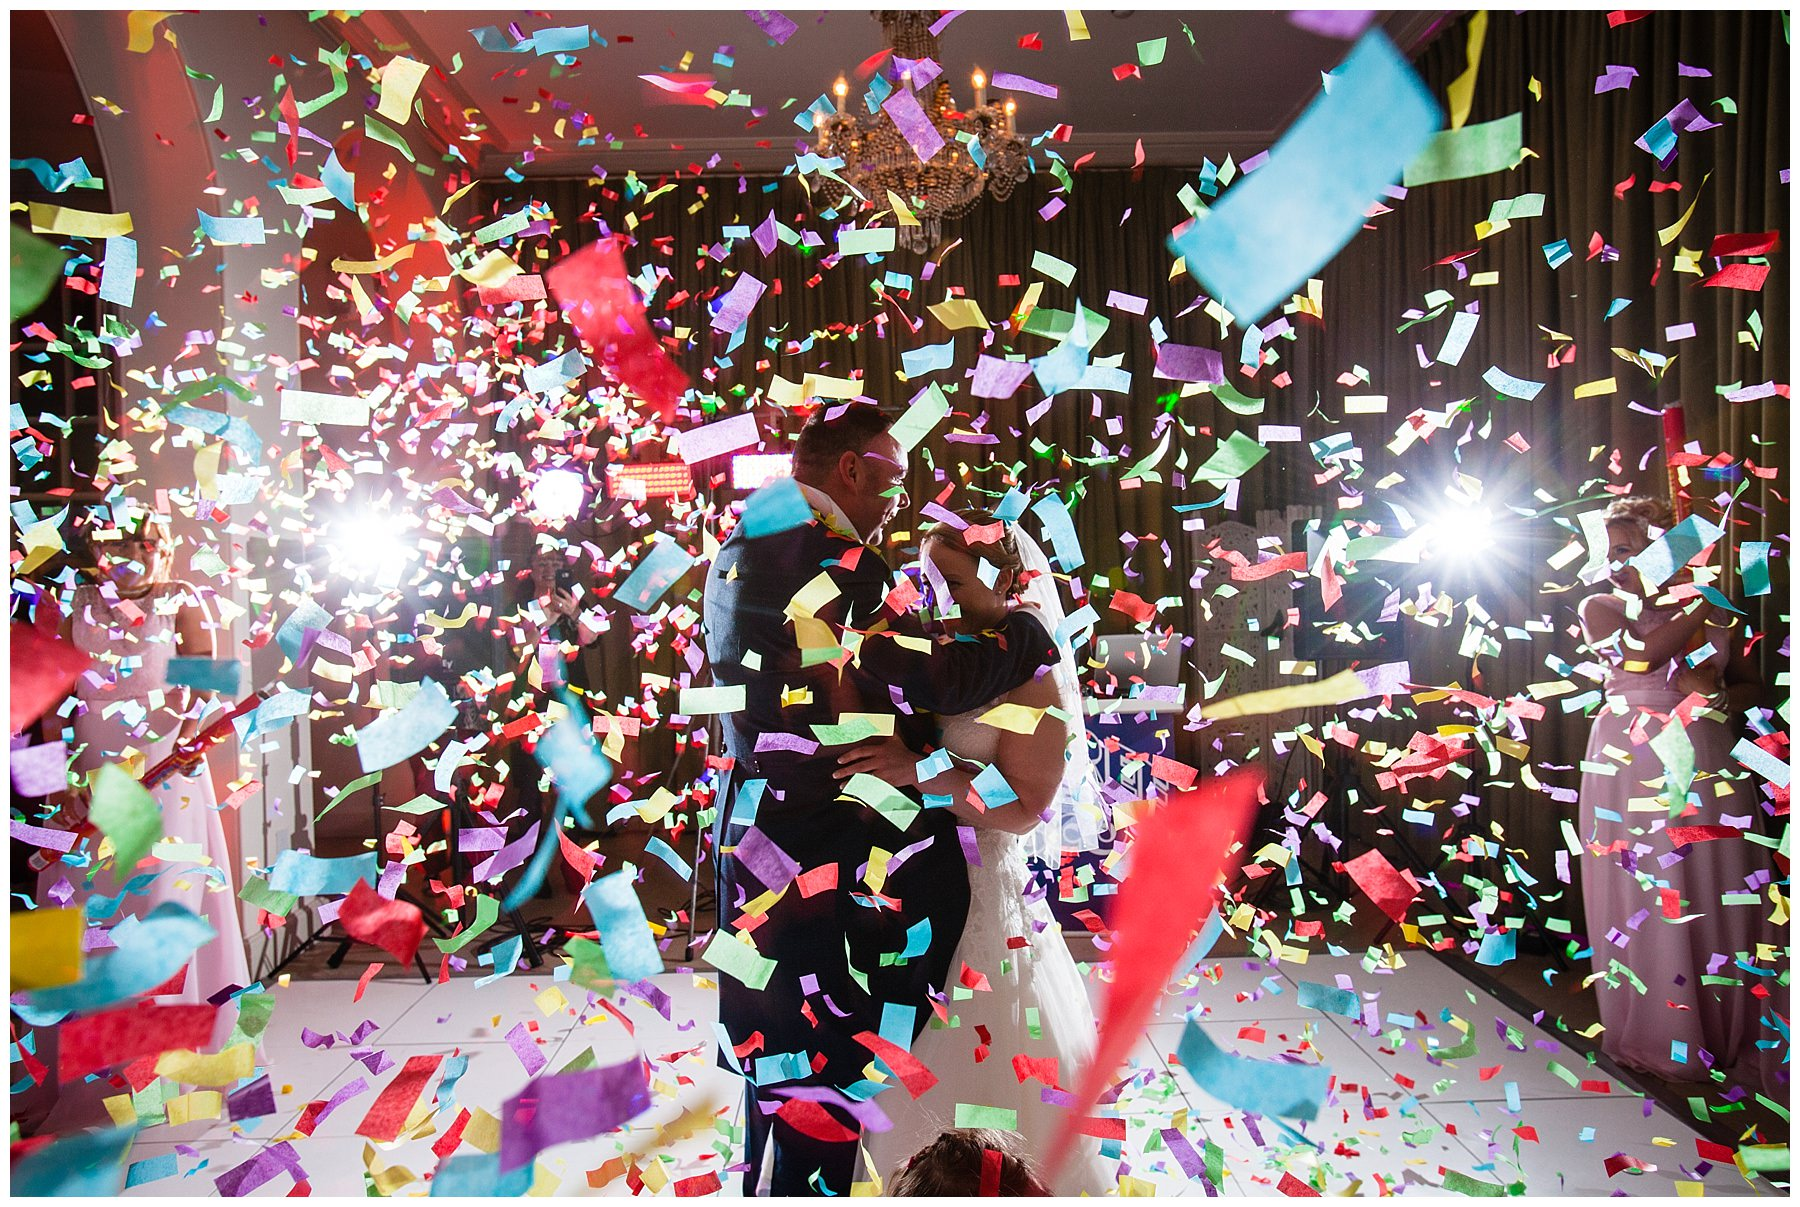 confetti-shot-shropshire-wedding-photographer4.jpg